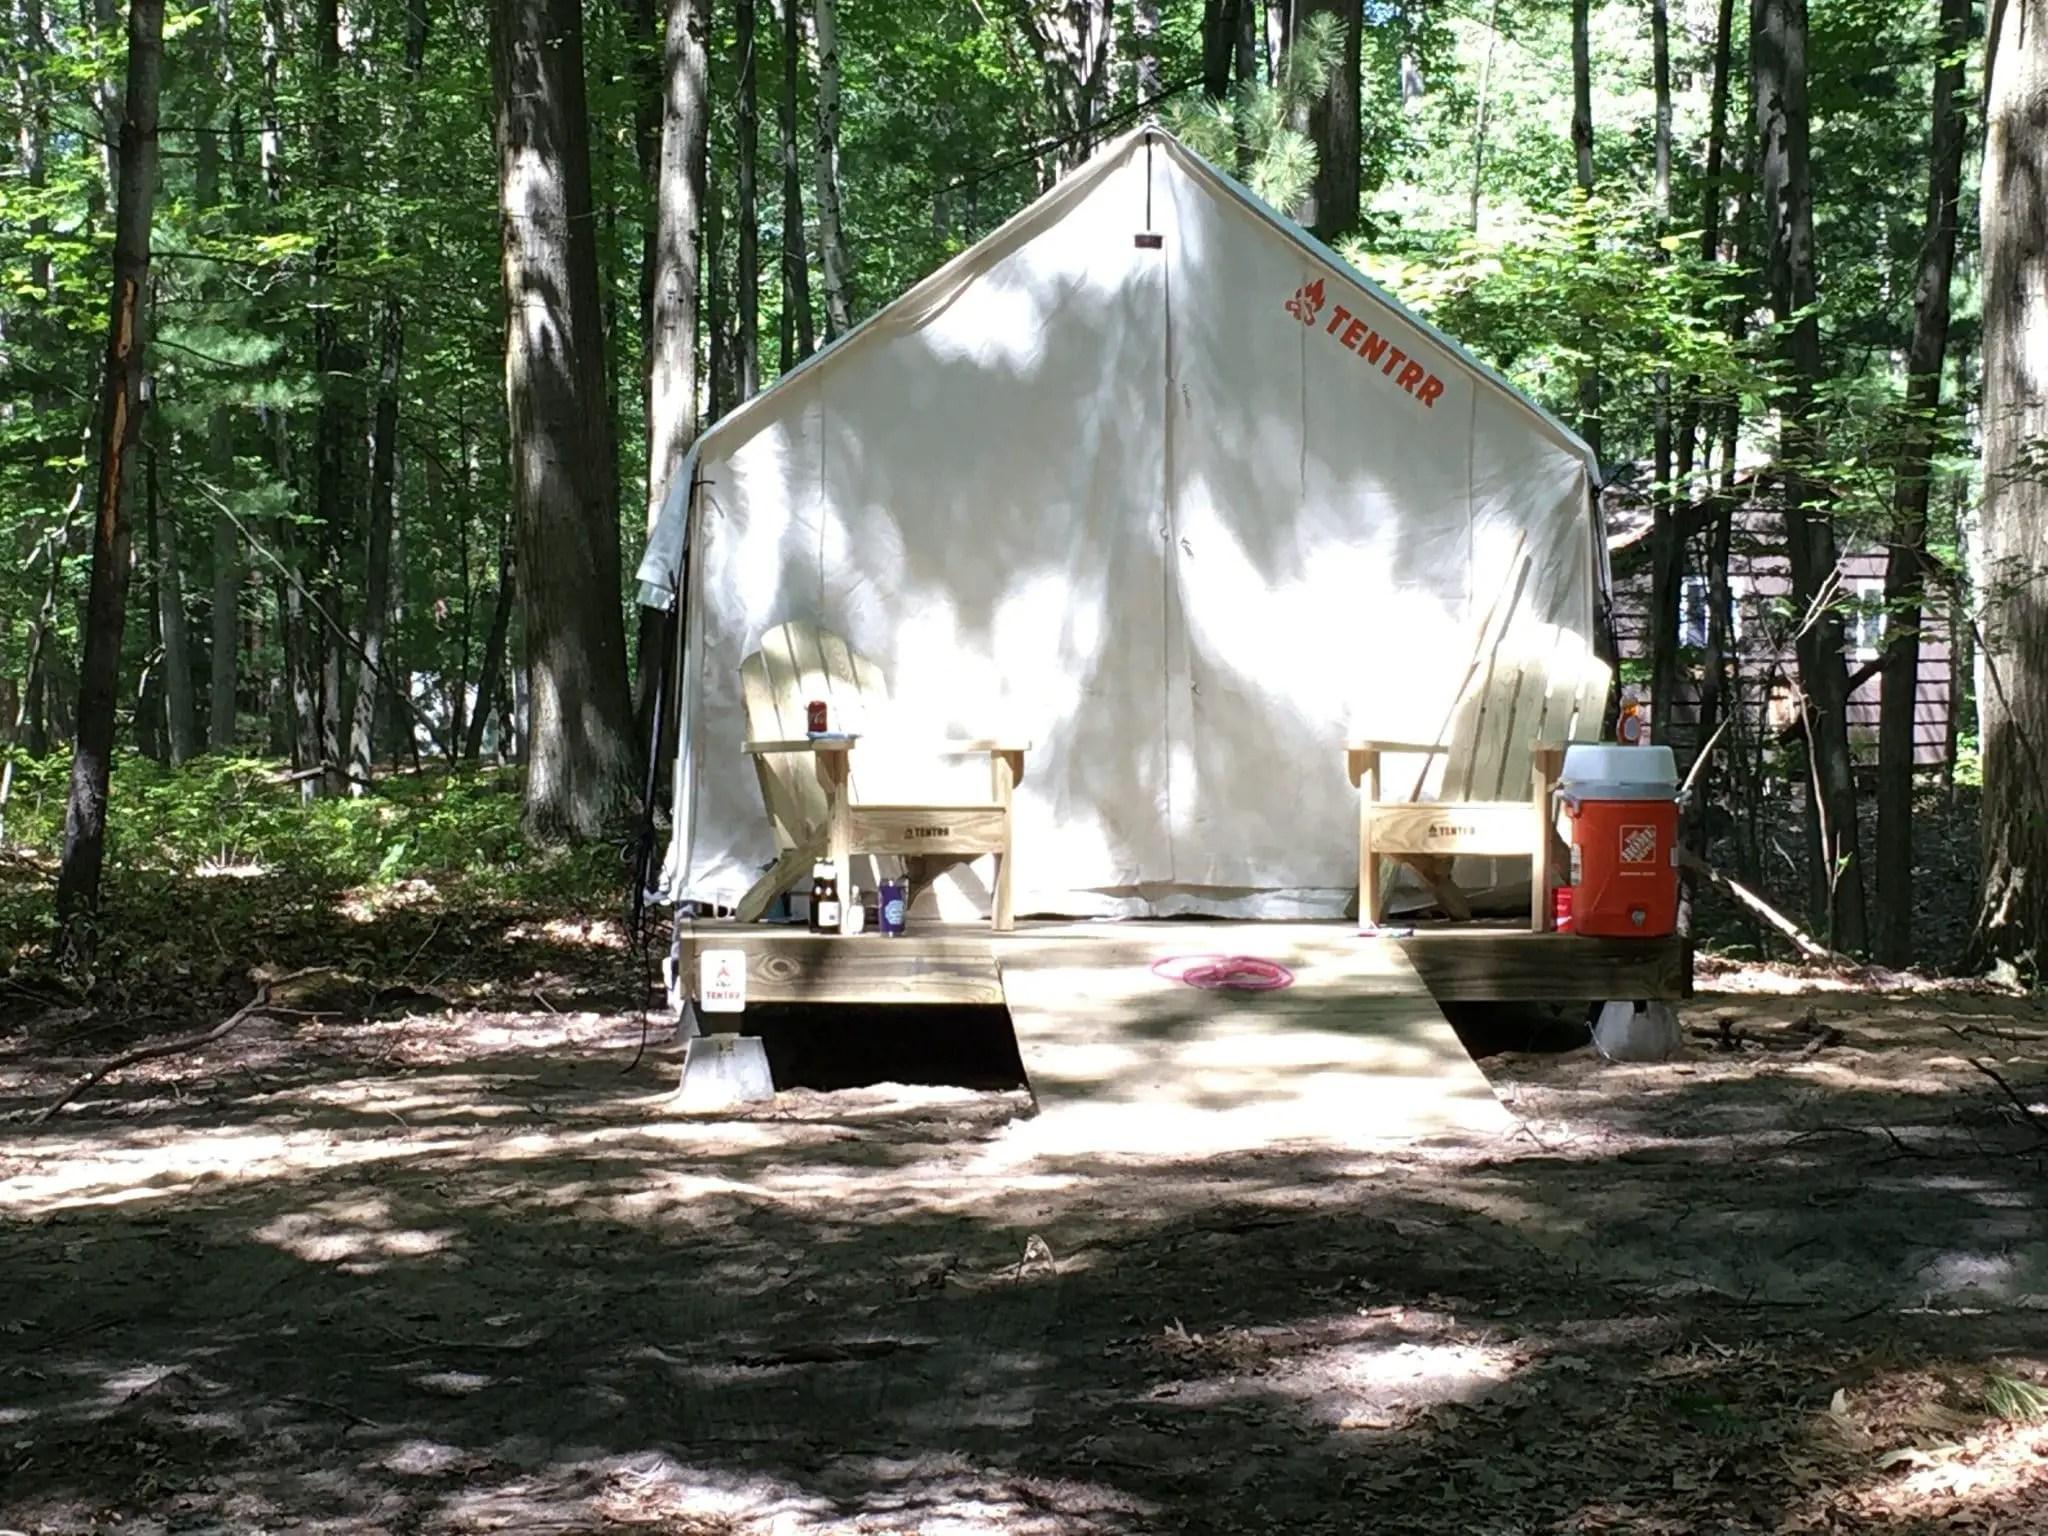 Safari Tent at Sleeper State Park